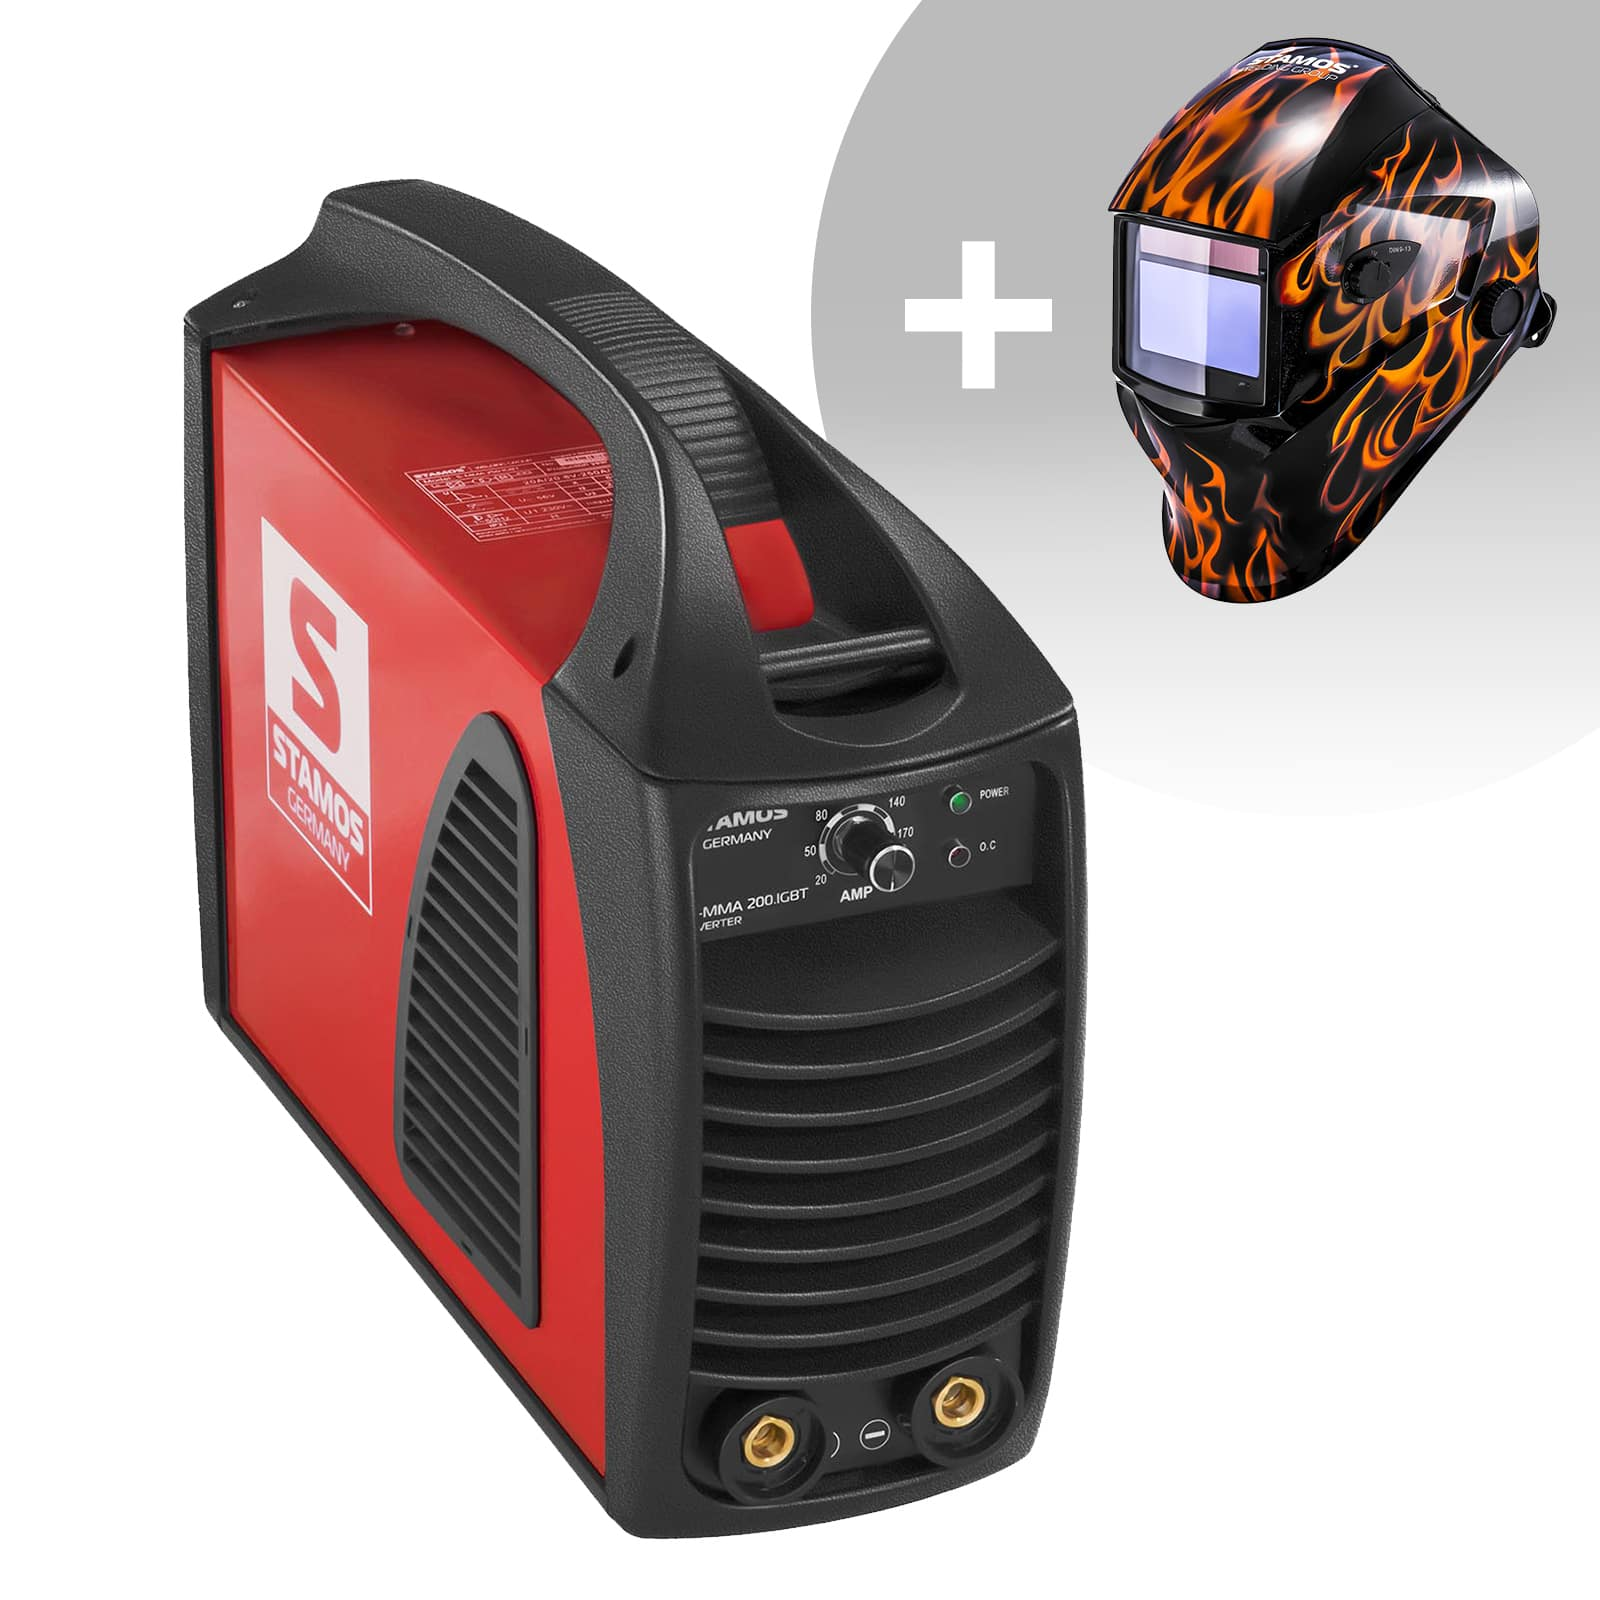 Zestaw spawarka MMA - 200 A - 230 V - IGBT - PLUS maska spawalnicza - Firestarter 500 - Advanced